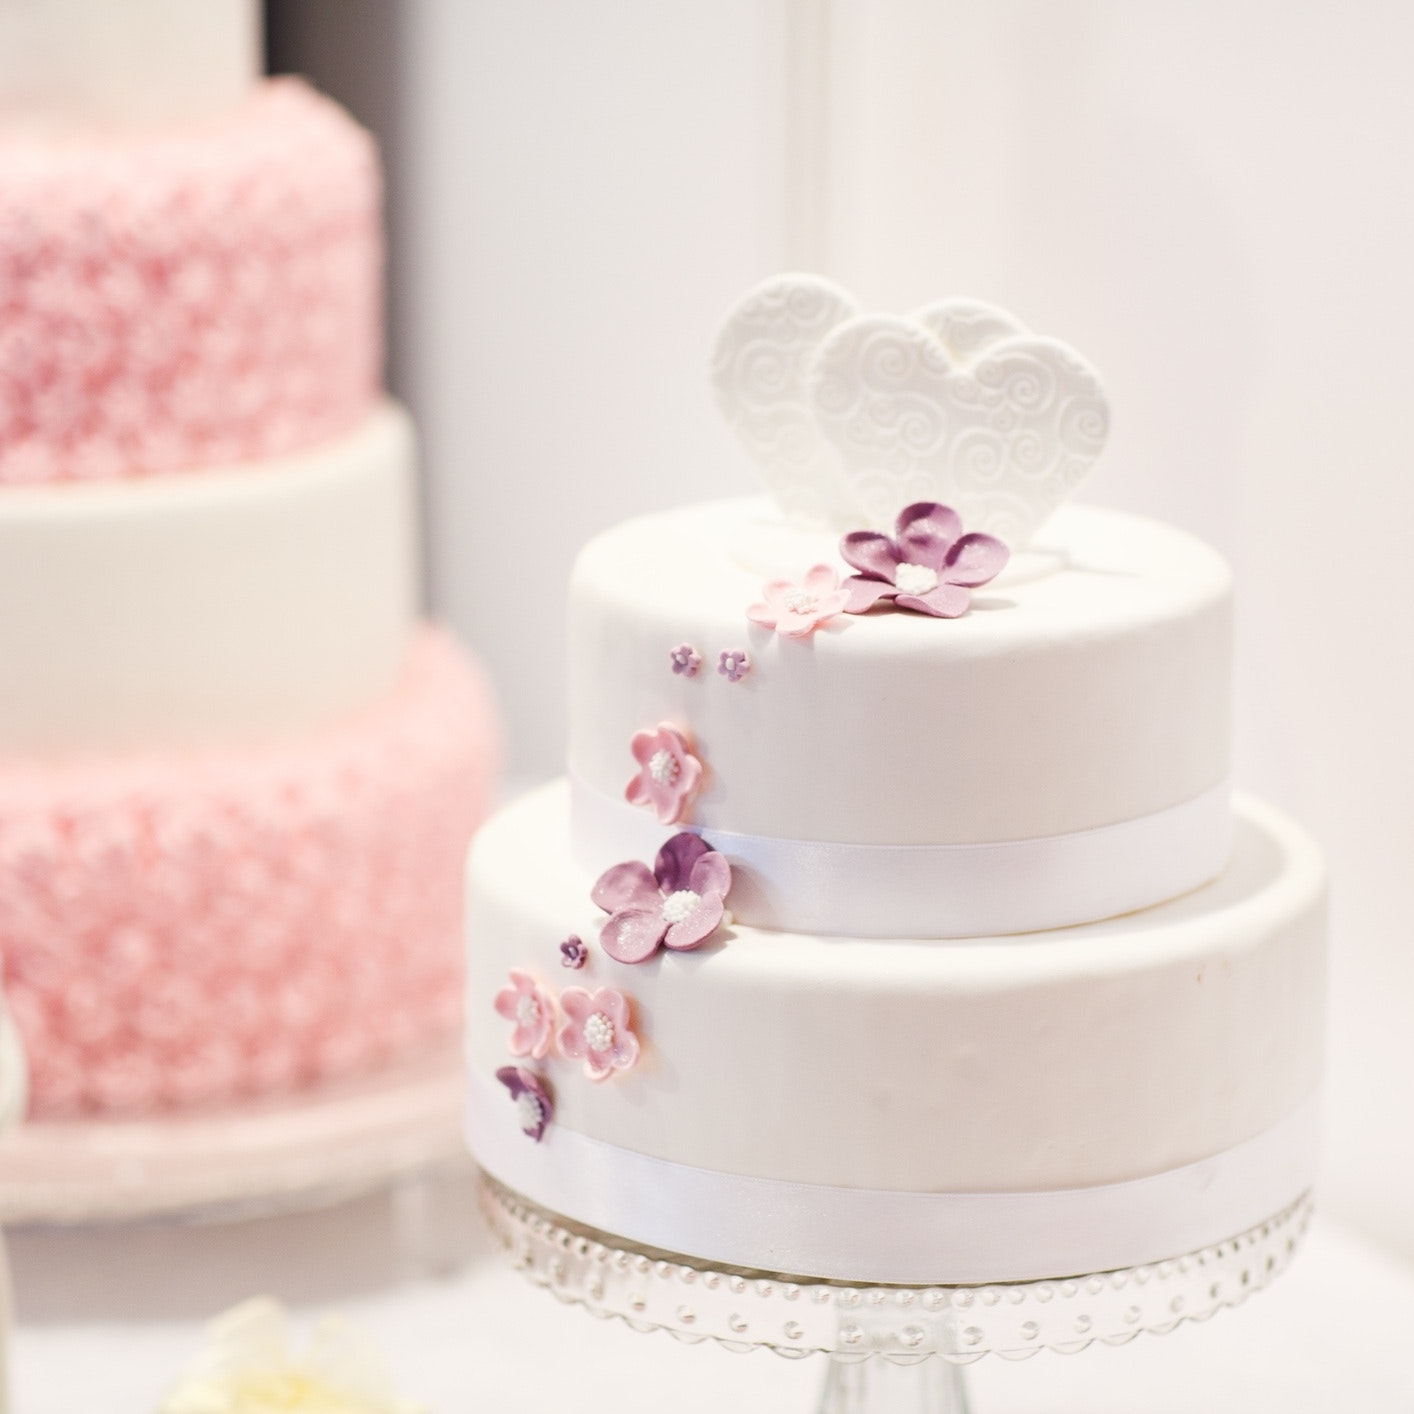 baked-bakery-birthday-265801.jpg